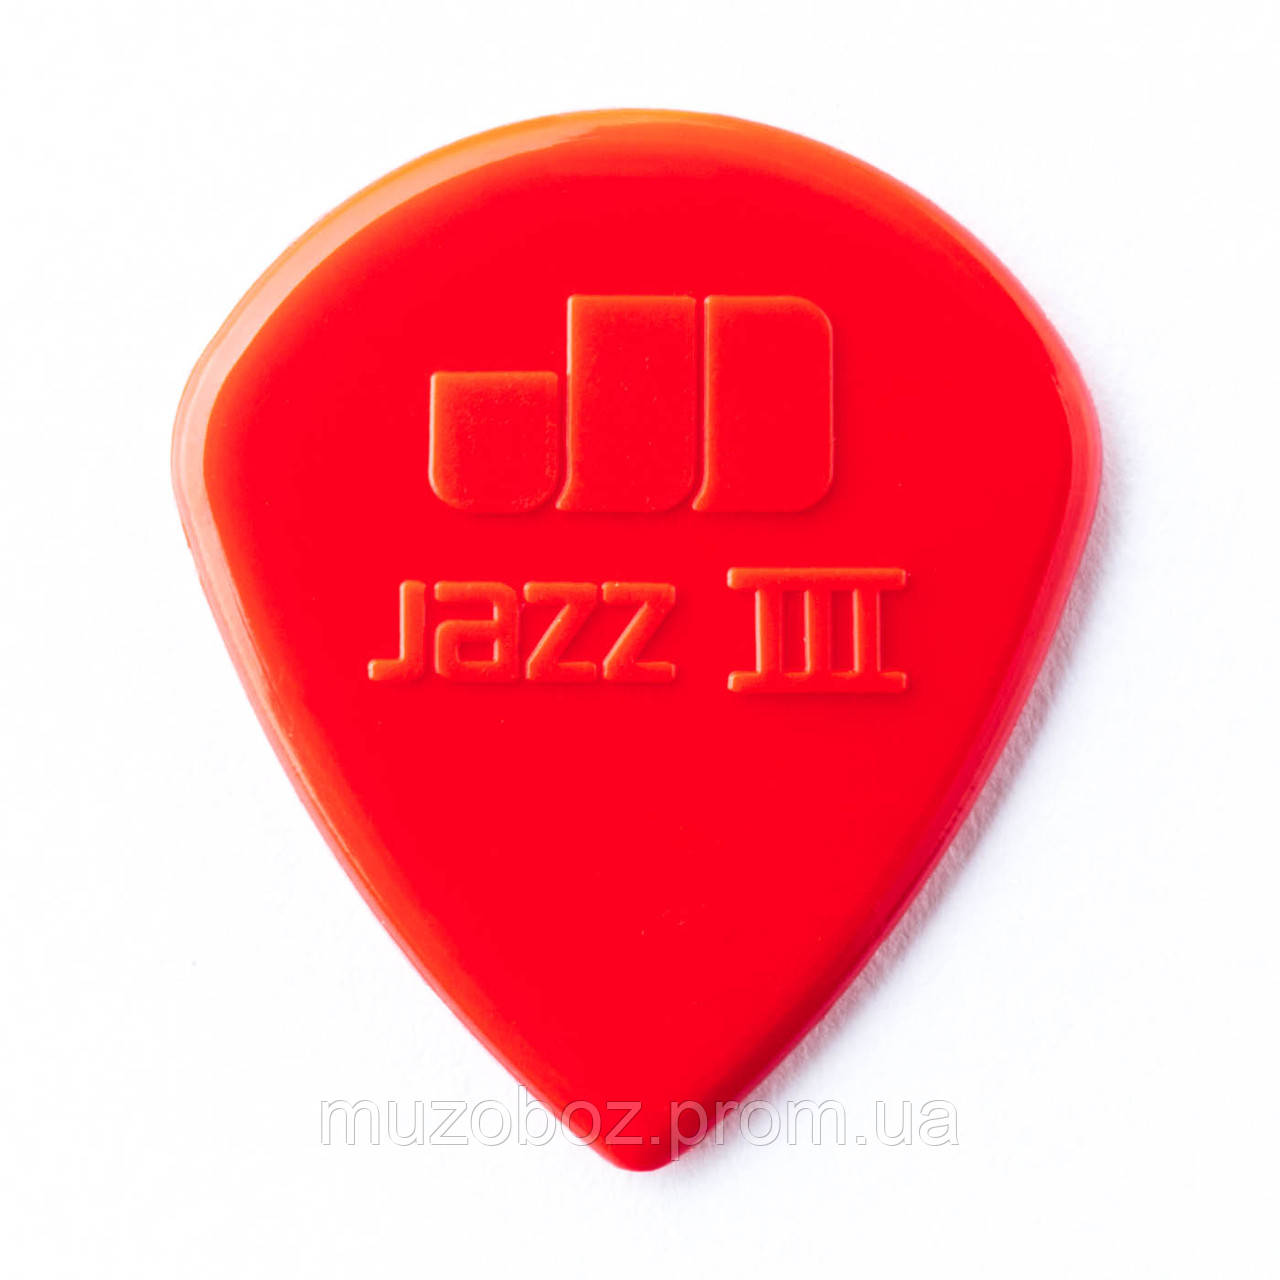 Jim Dunlop Nylon Max Grip Jazz III 1.38 mm Picks Red, Pack of 6